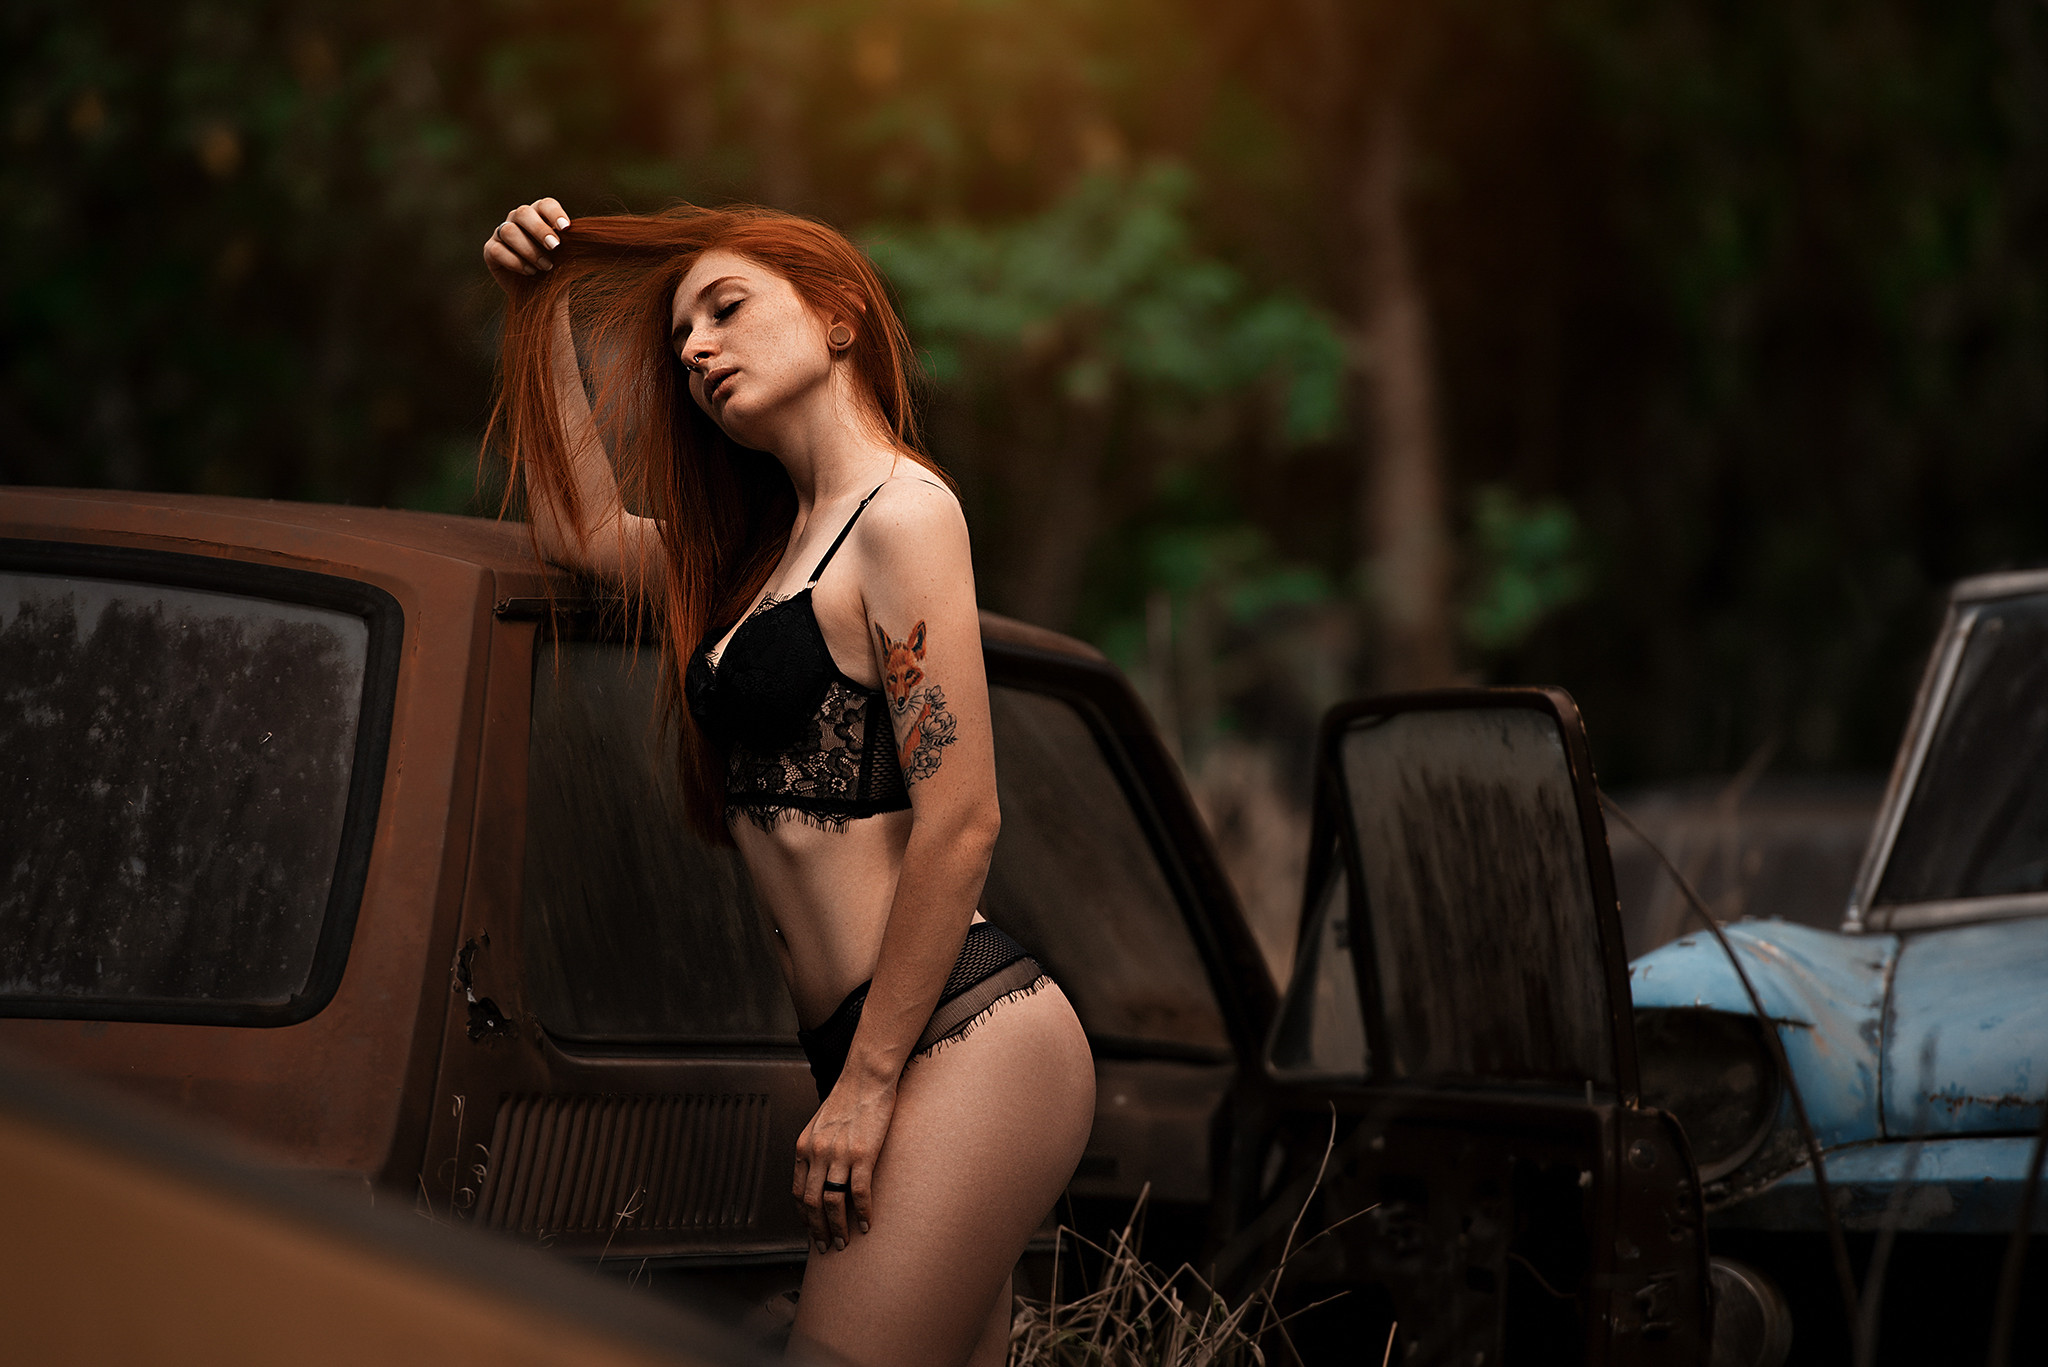 People 2048x1367 women model redhead lingerie black lingerie rust hands in hair pierced septum tattoo inked girls women outdoors closed eyes